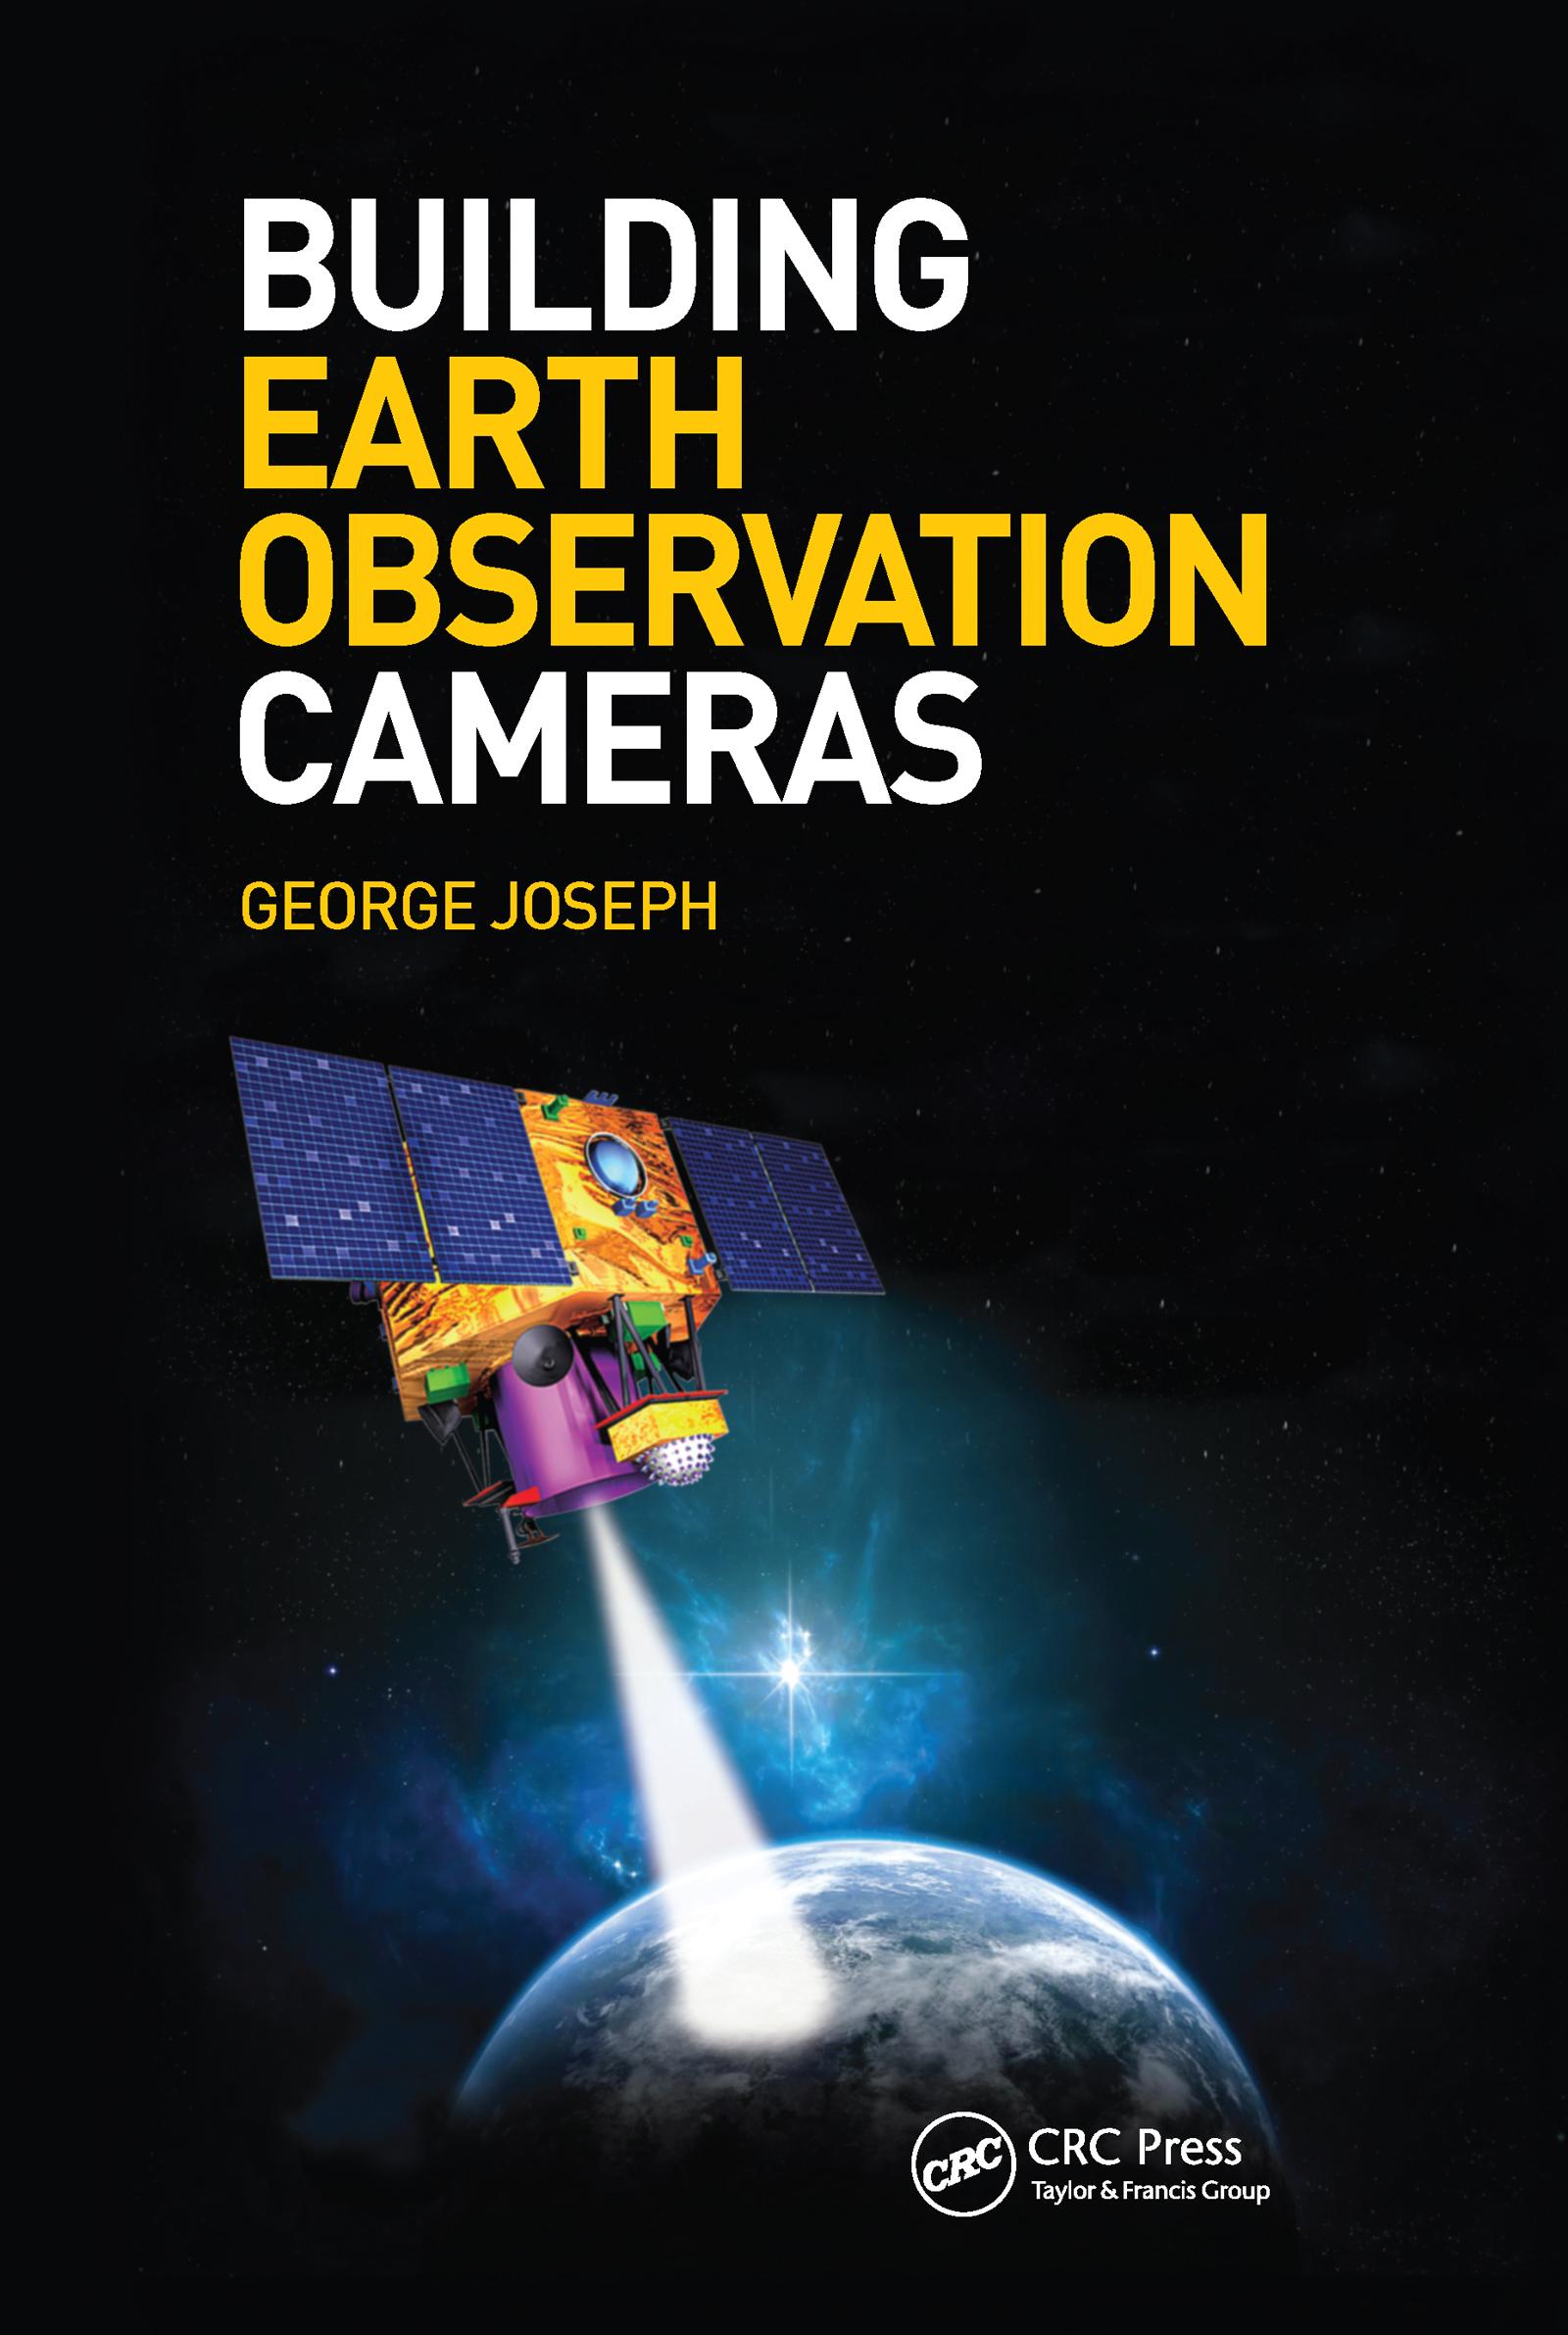 Building Earth Observation Cameras